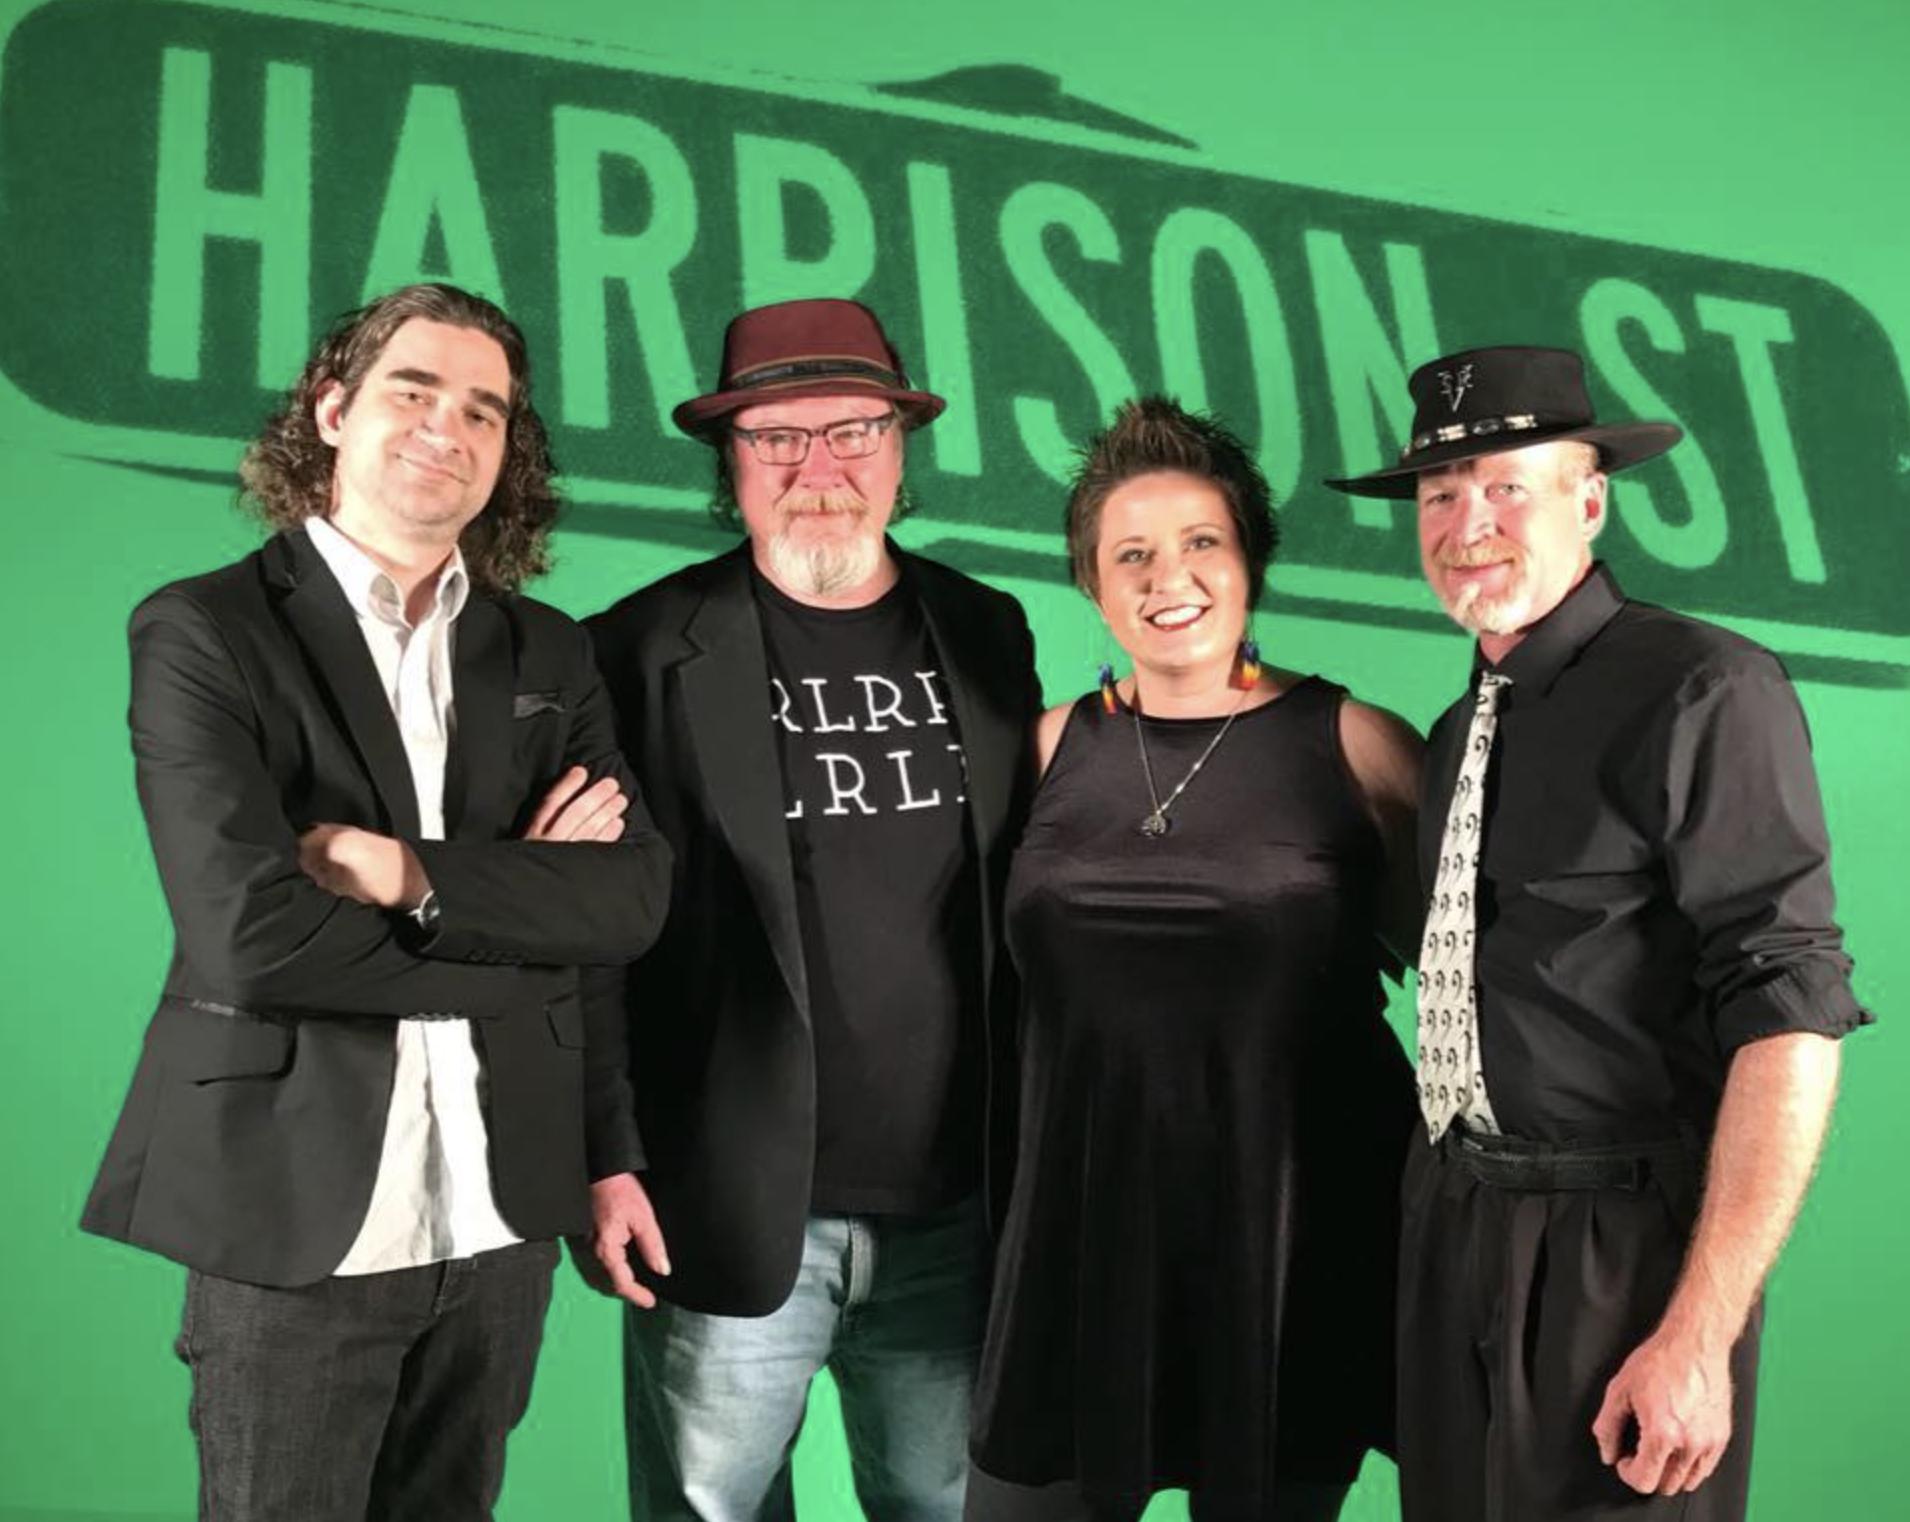 Harrison Street Band